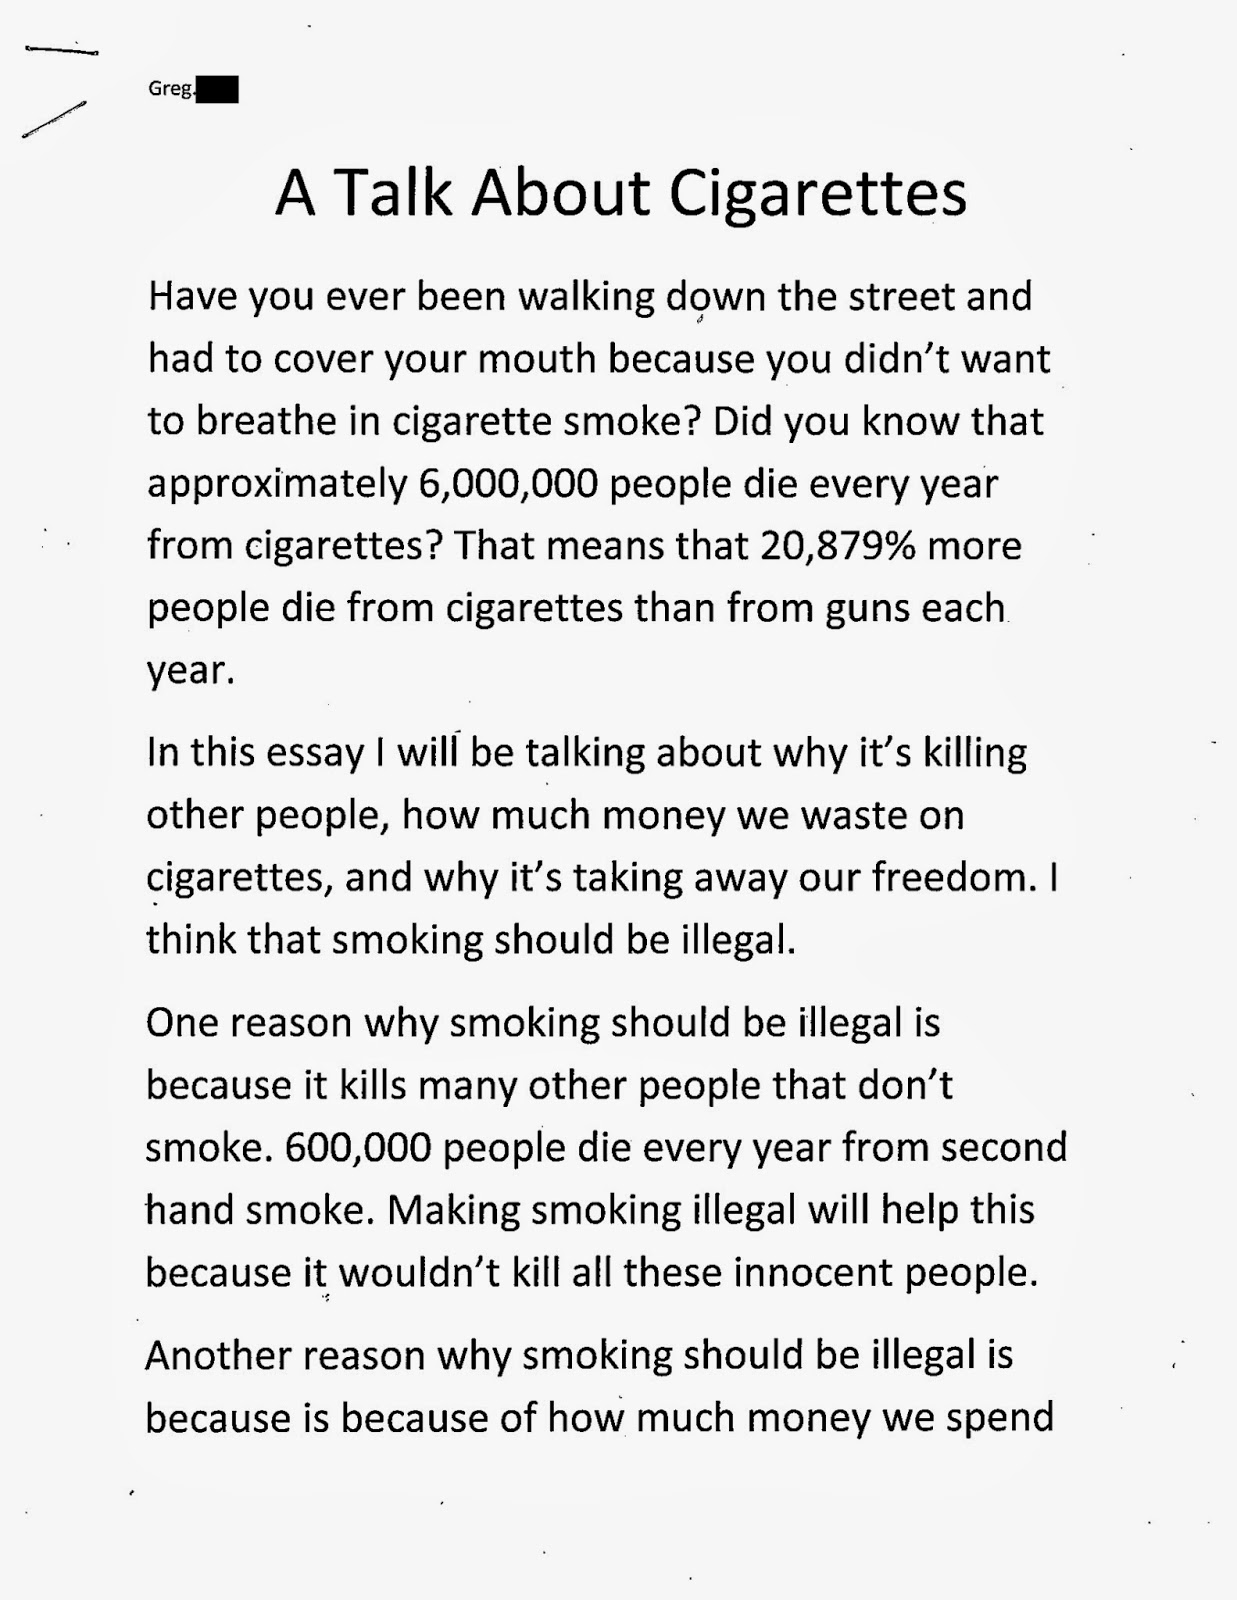 essay about cigarettes should be illegal Should cigarettes be made illegal health, medicine, nursing essay.